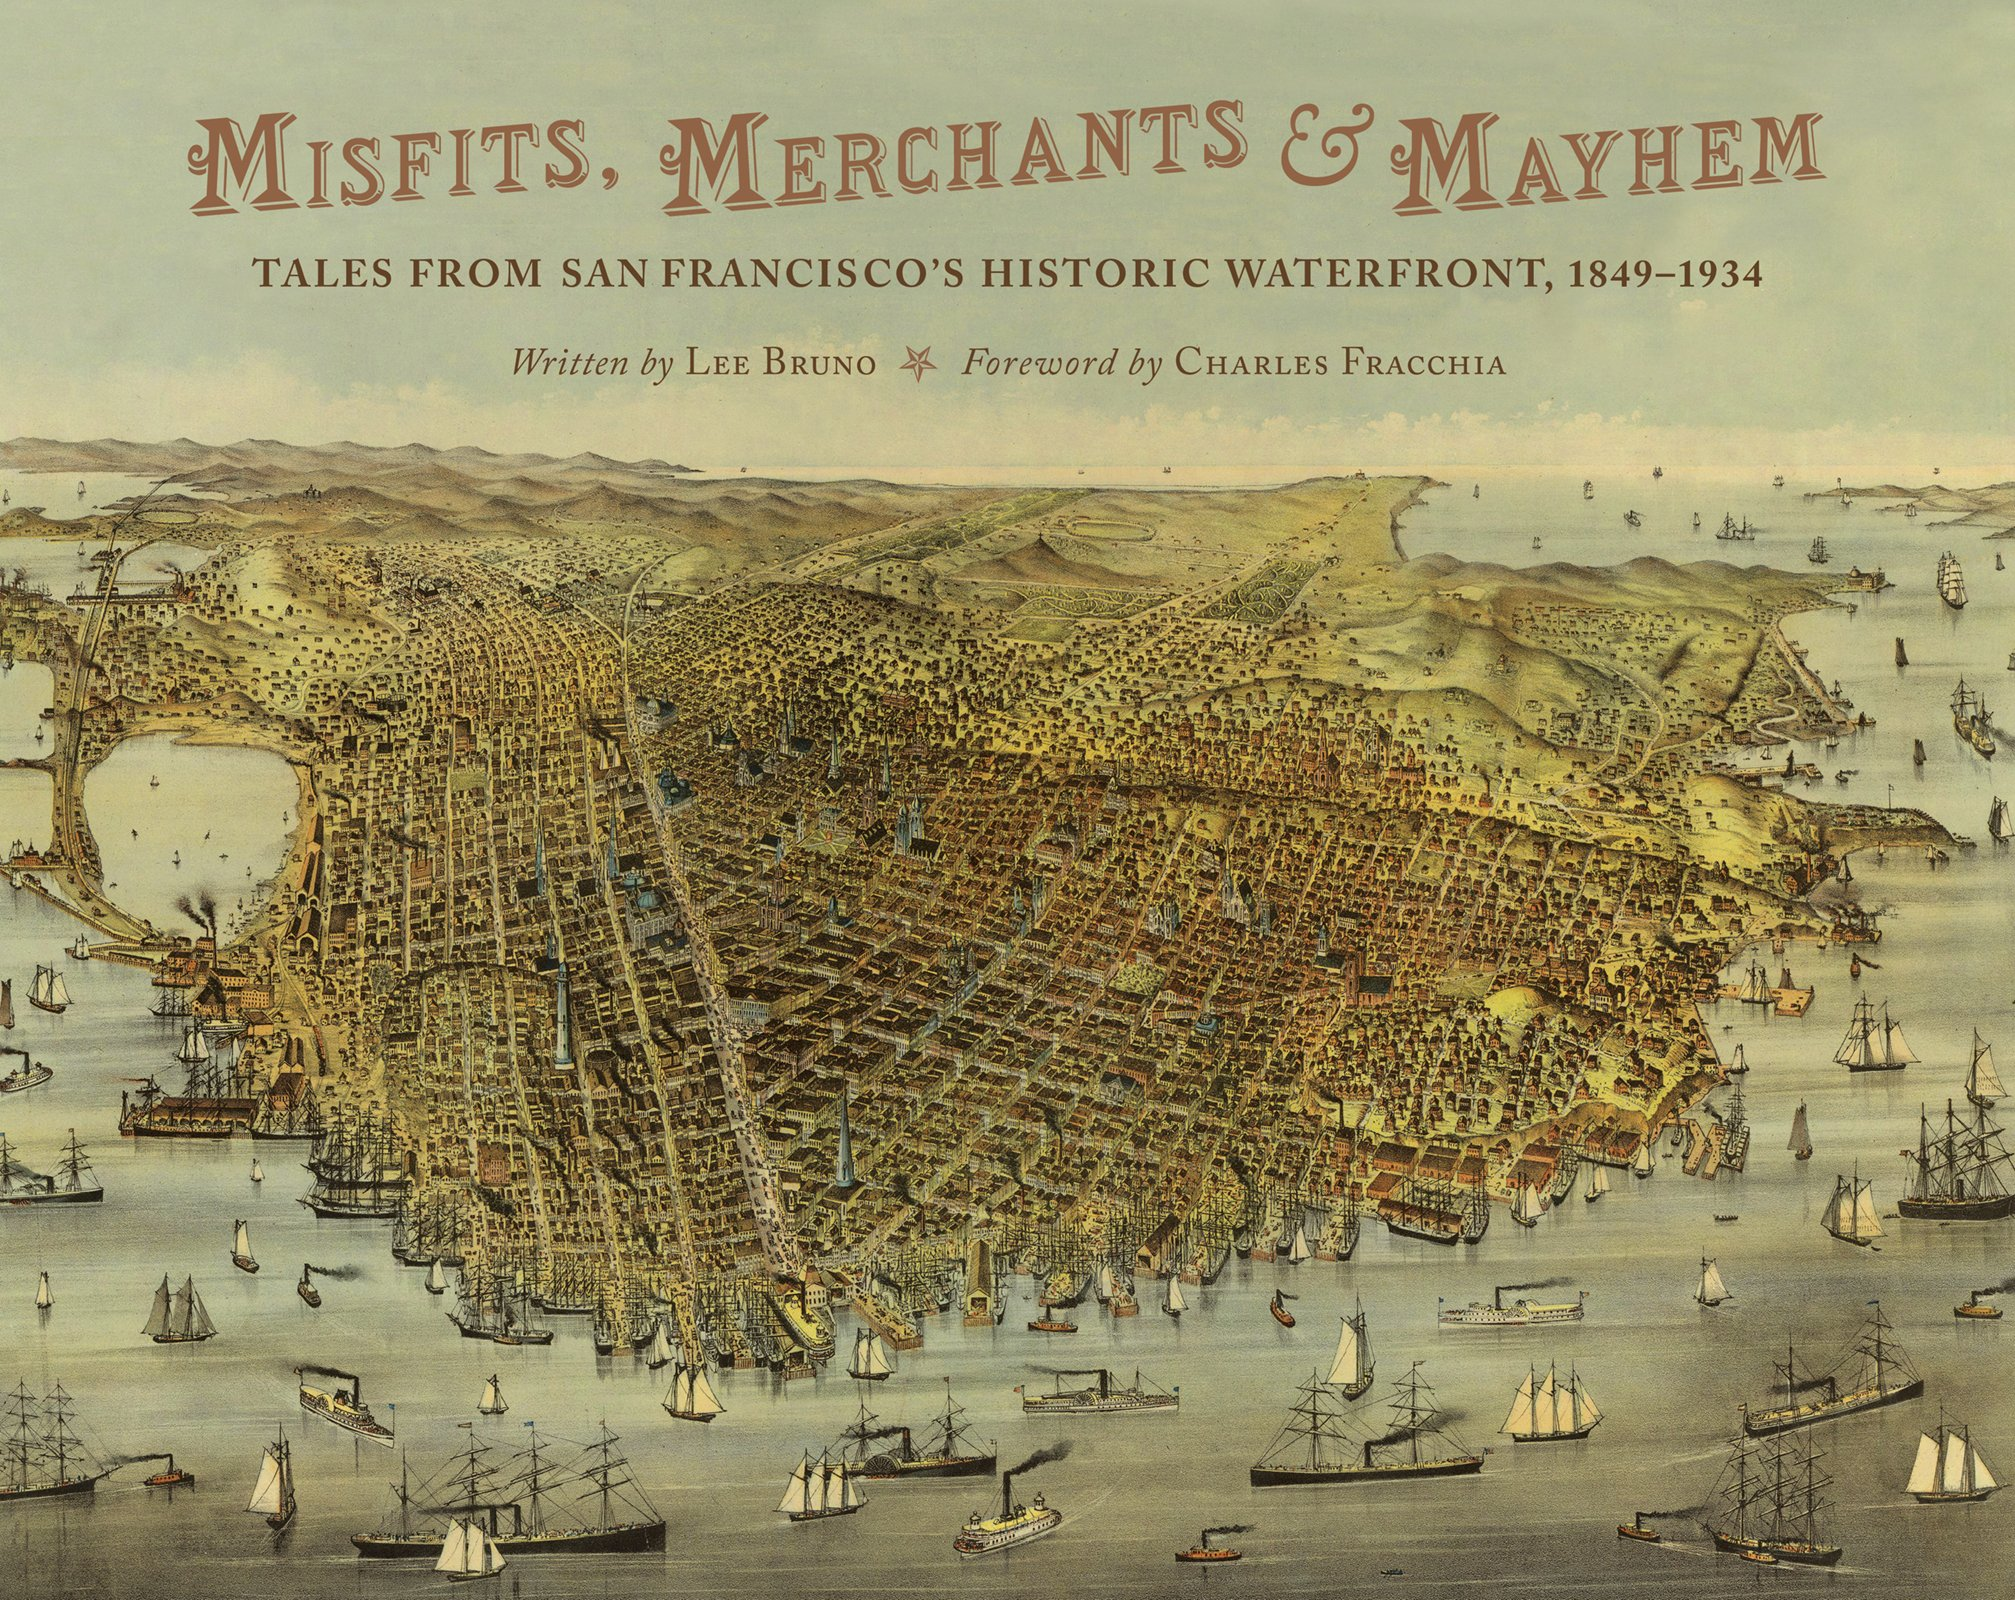 Read Online Misfits, Merchants, and Mayhem: Tales from San Francisco's Historic Waterfront, 1849-1934 PDF